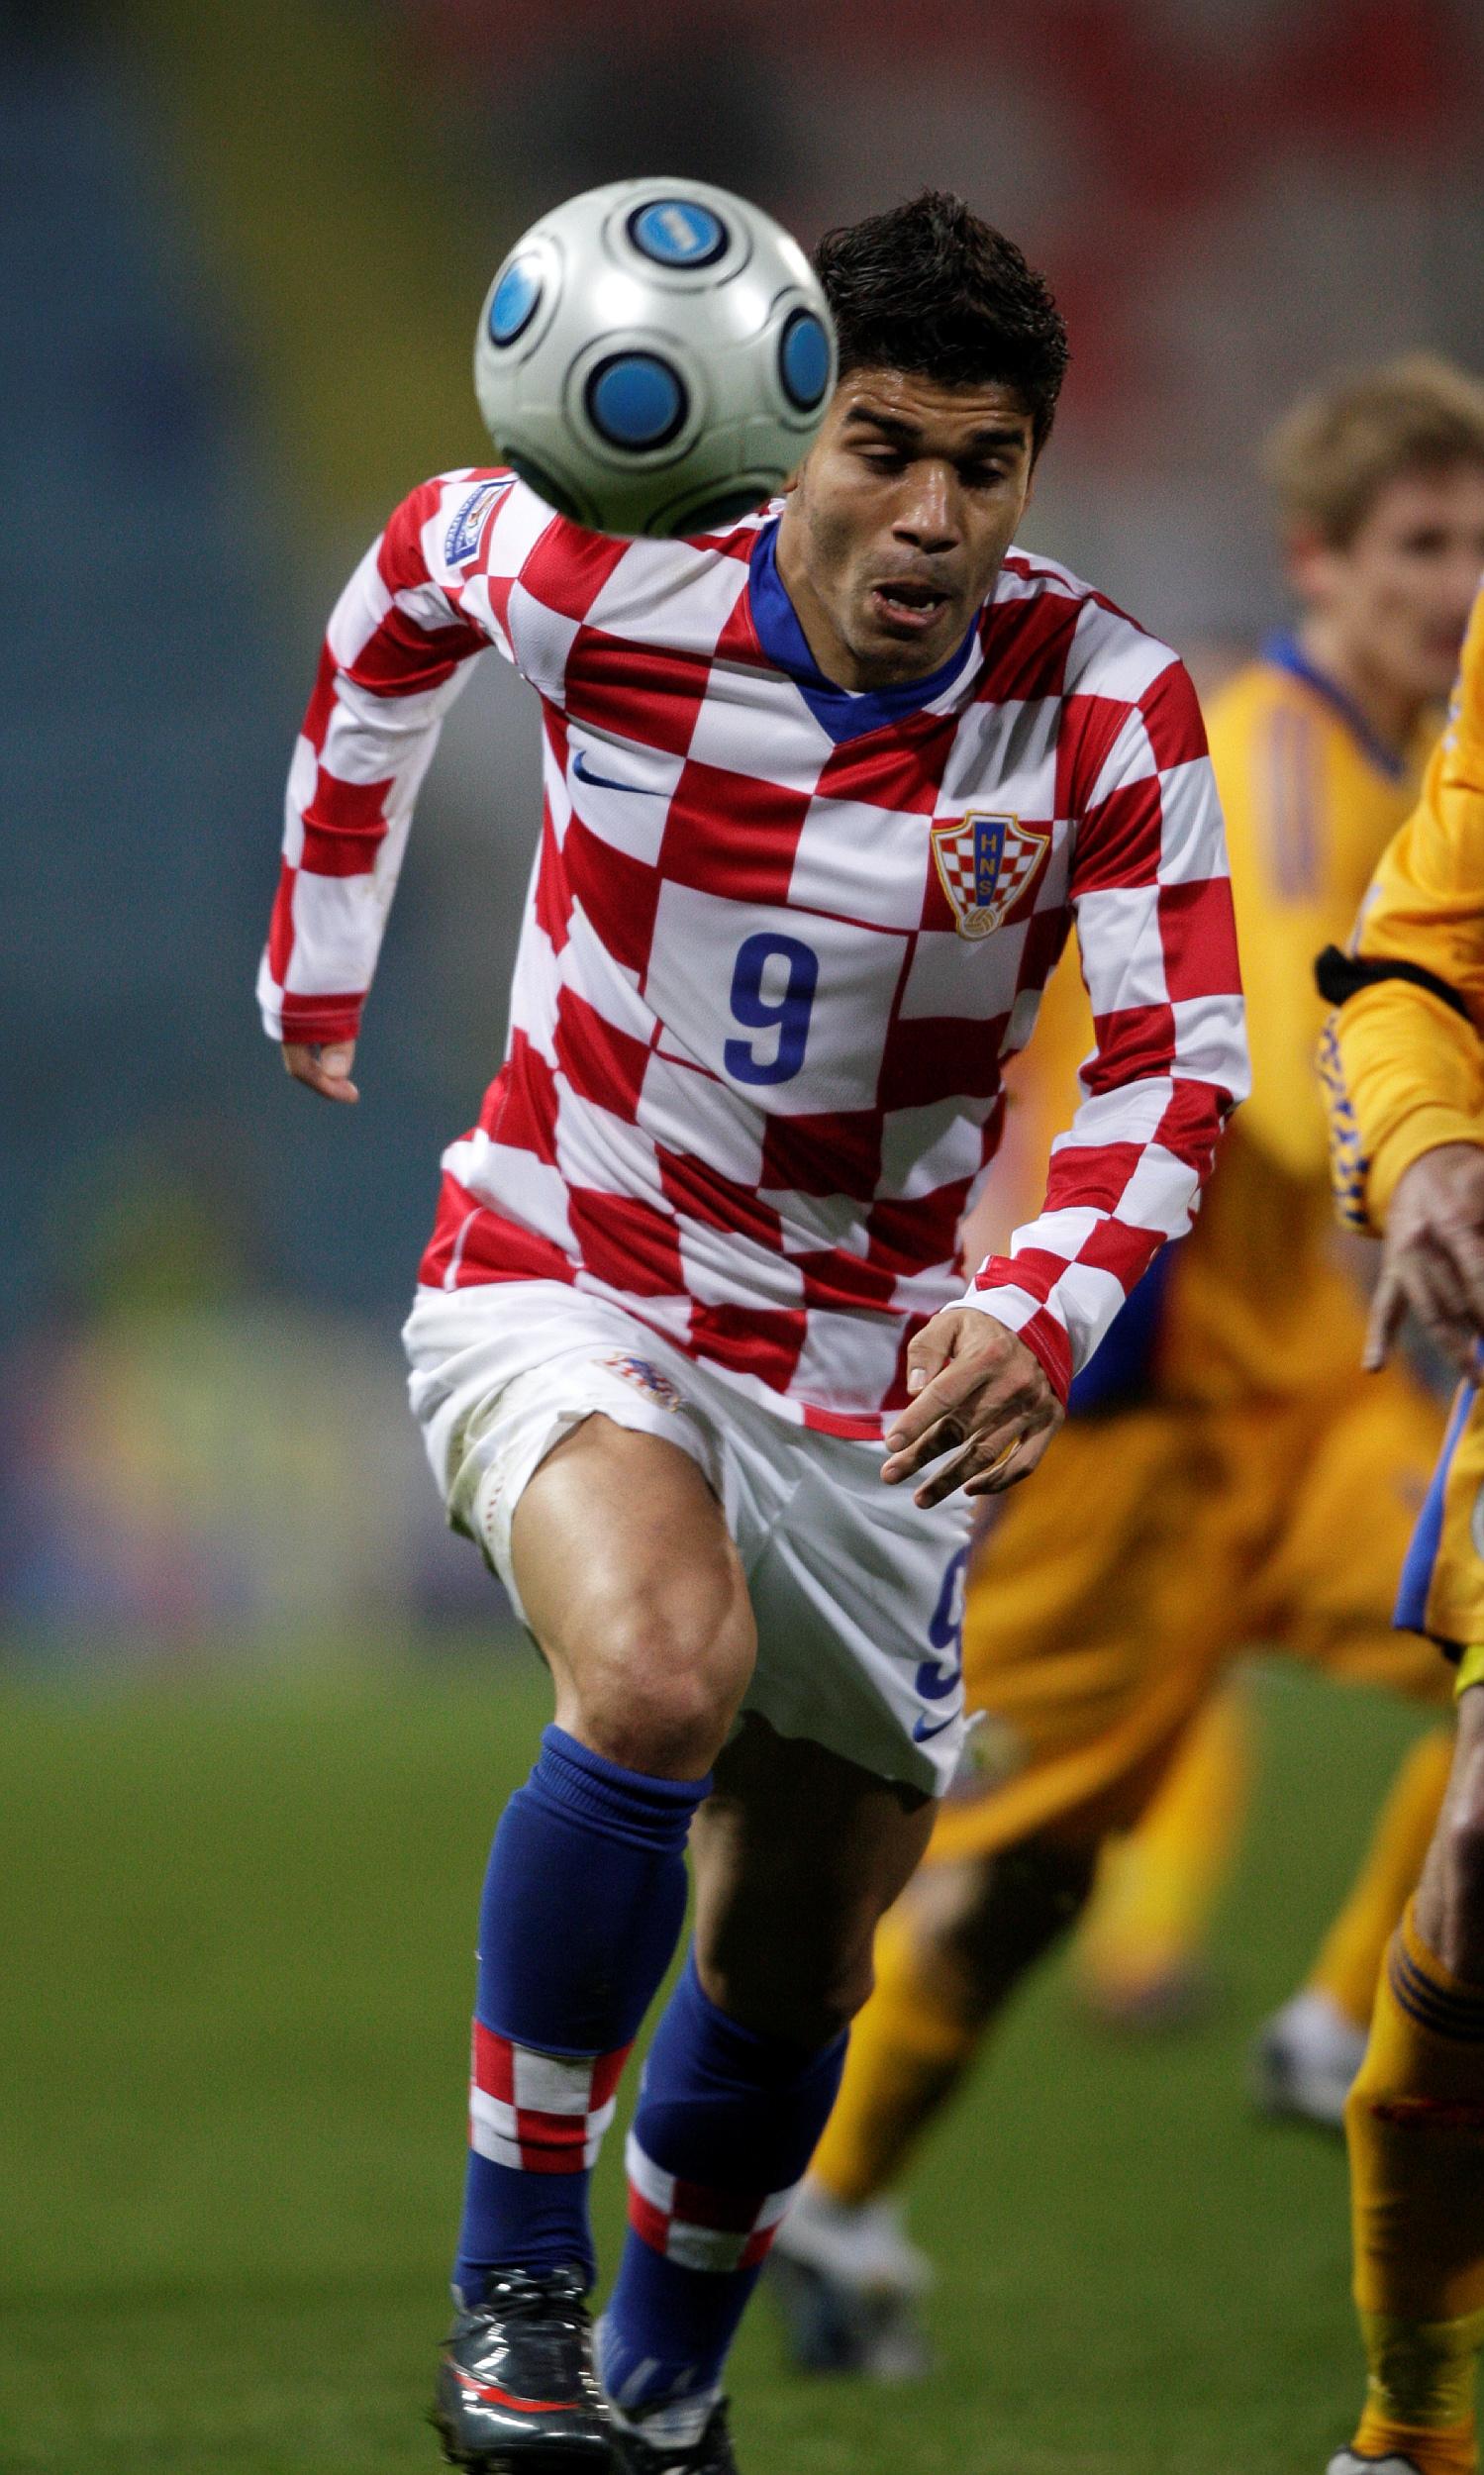 Bukurest, 110209.  Ghencea stadion.  Prijateljska utakmica Rumunjska- Hrvatska.  Eduardo Da Silva.  Foto: Ronald Gorsic / CROPIX